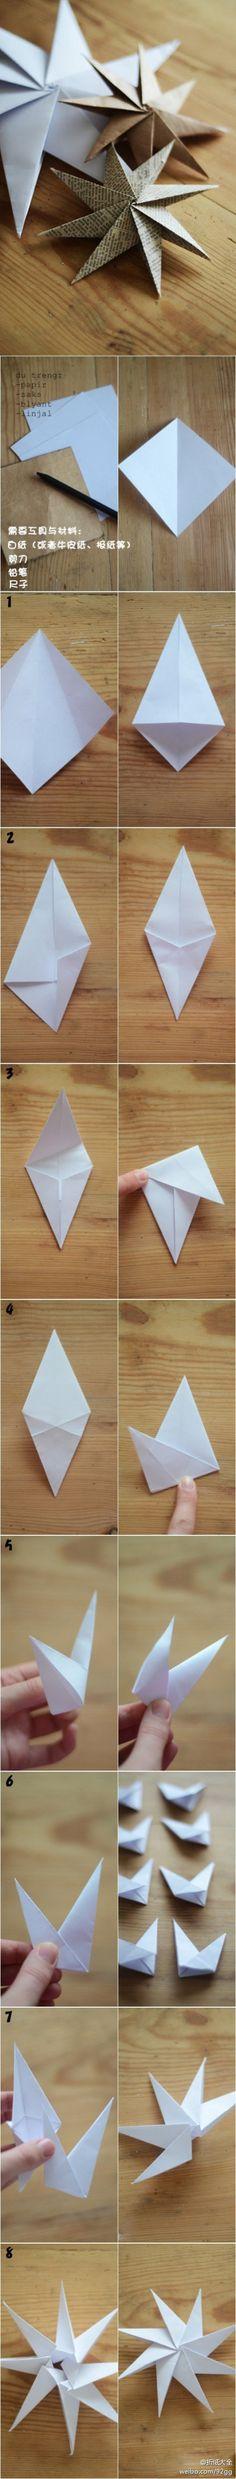 diy ideas, craft kids, paper stars, diy crafts, origami paper, christmas ornaments, craft ideas, paper crafts, kid crafts